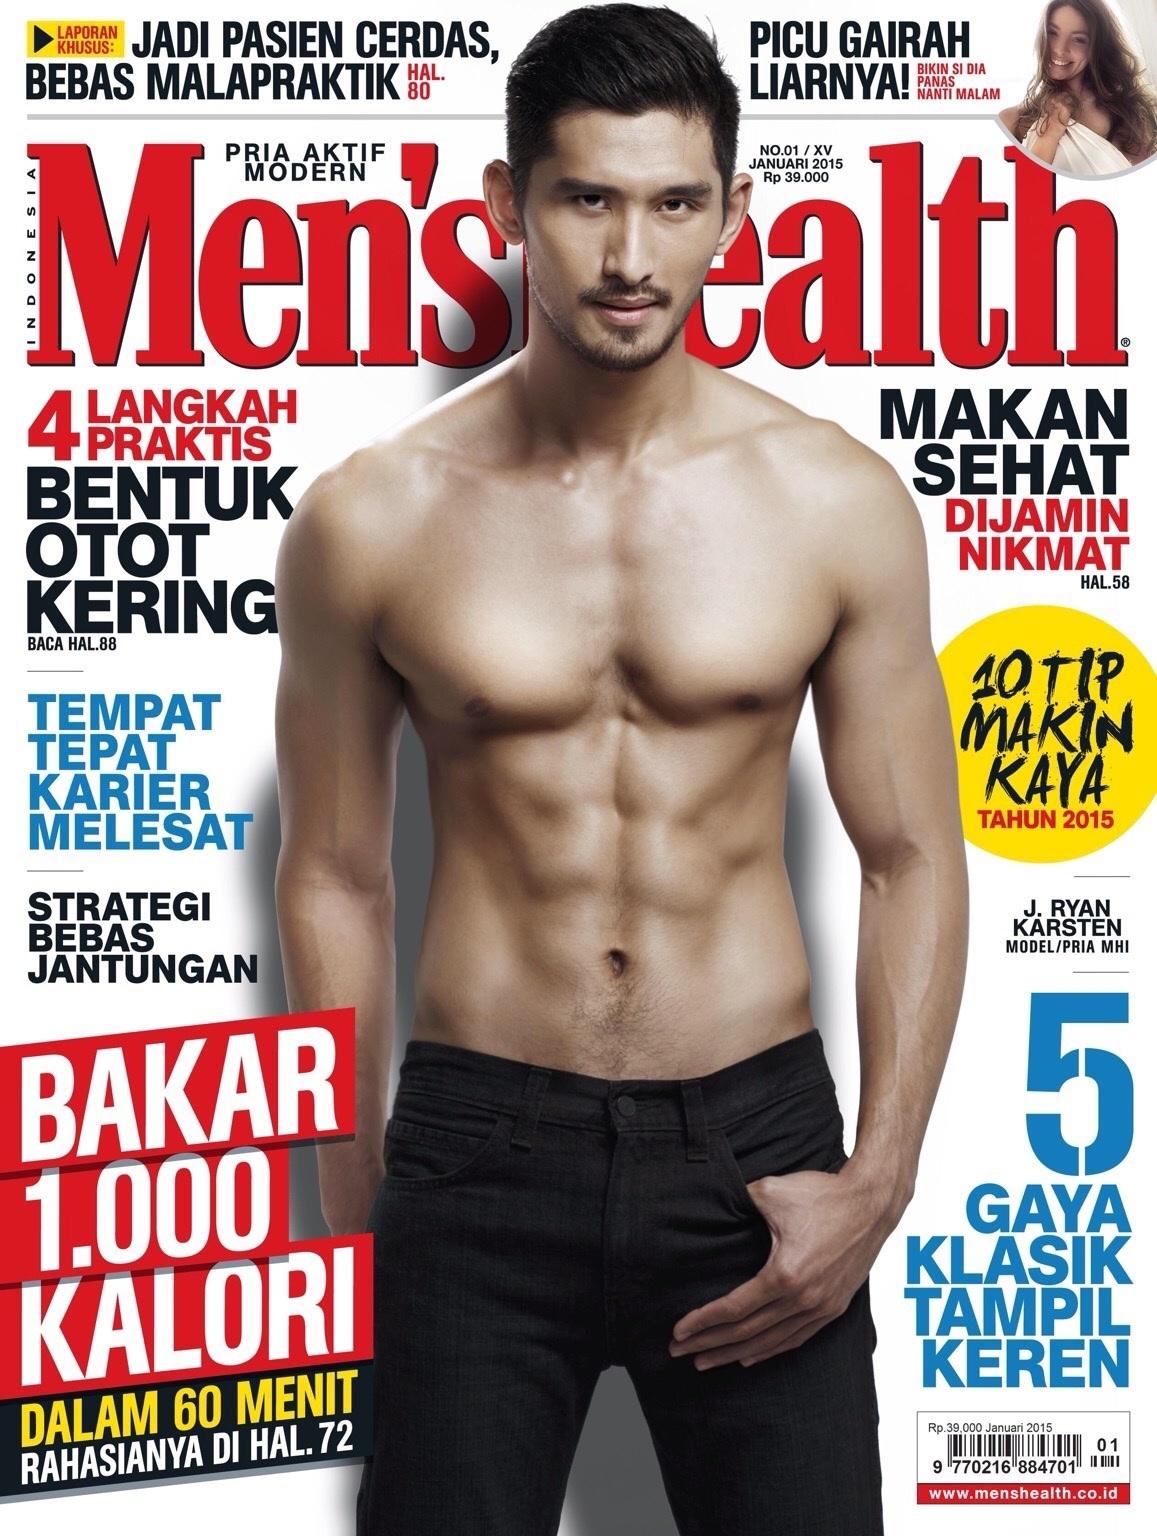 For Men's Health Cover 2015